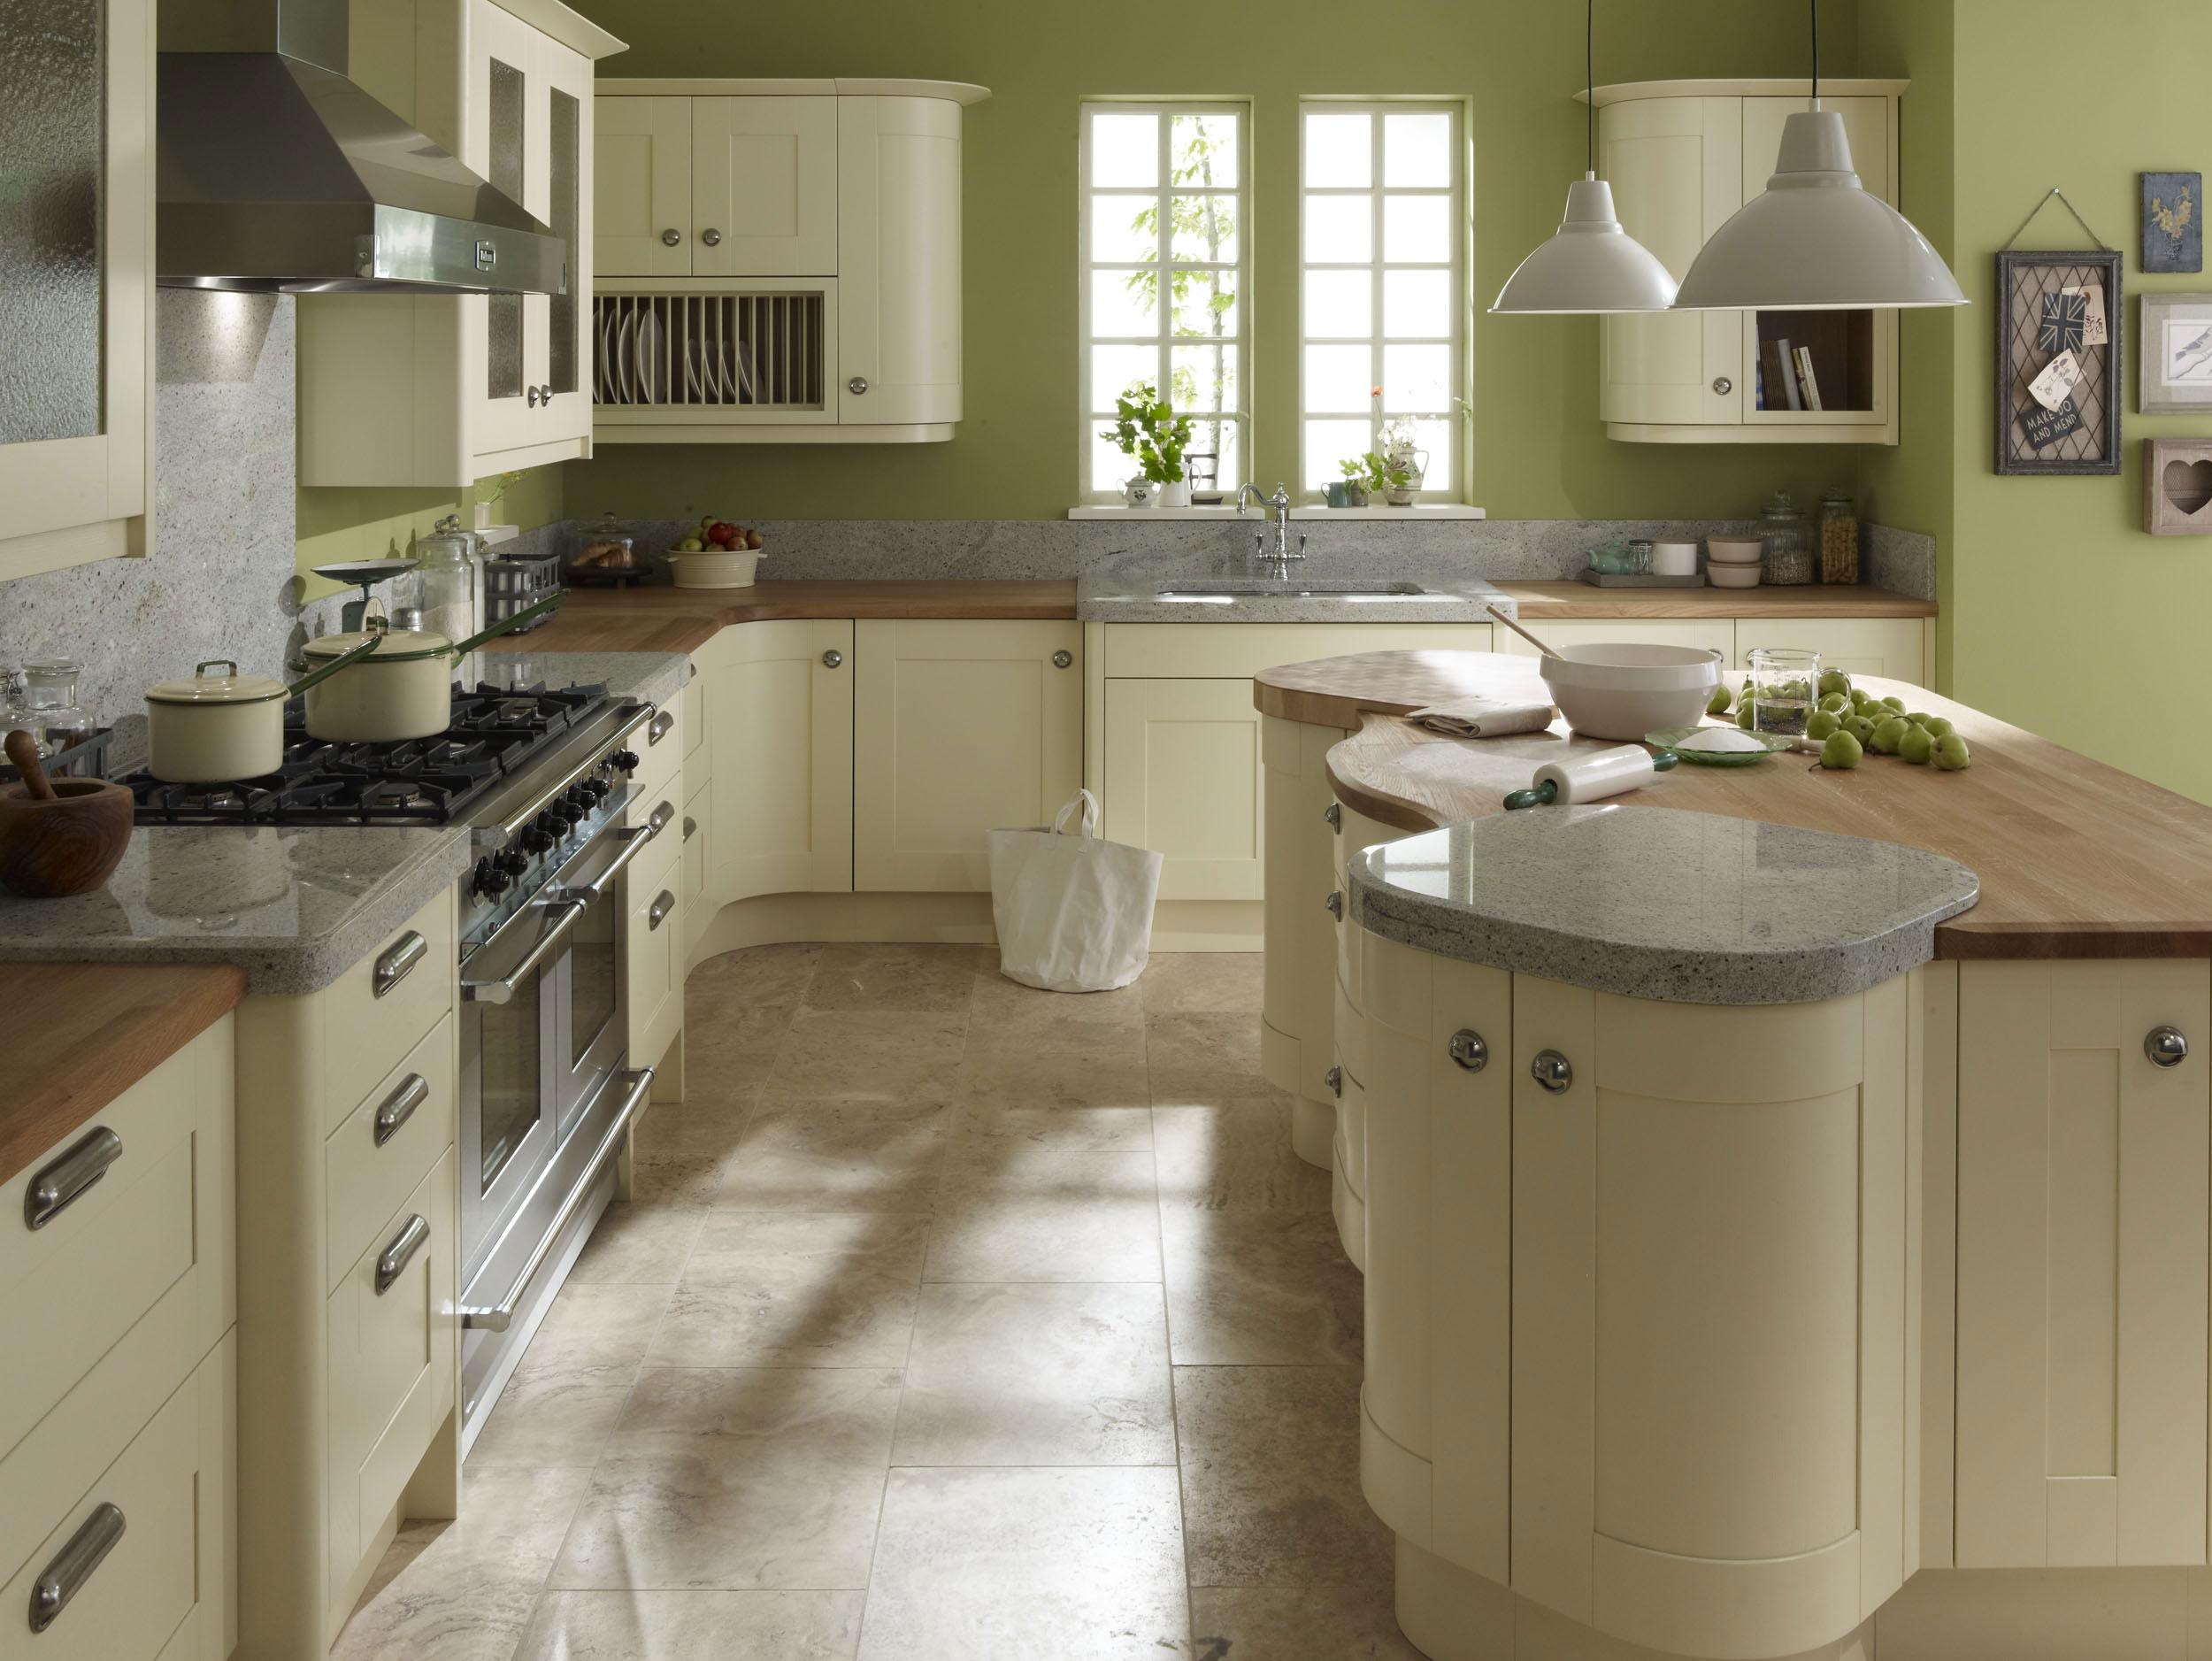 kitchen ideas ivory cabinets photo - 6